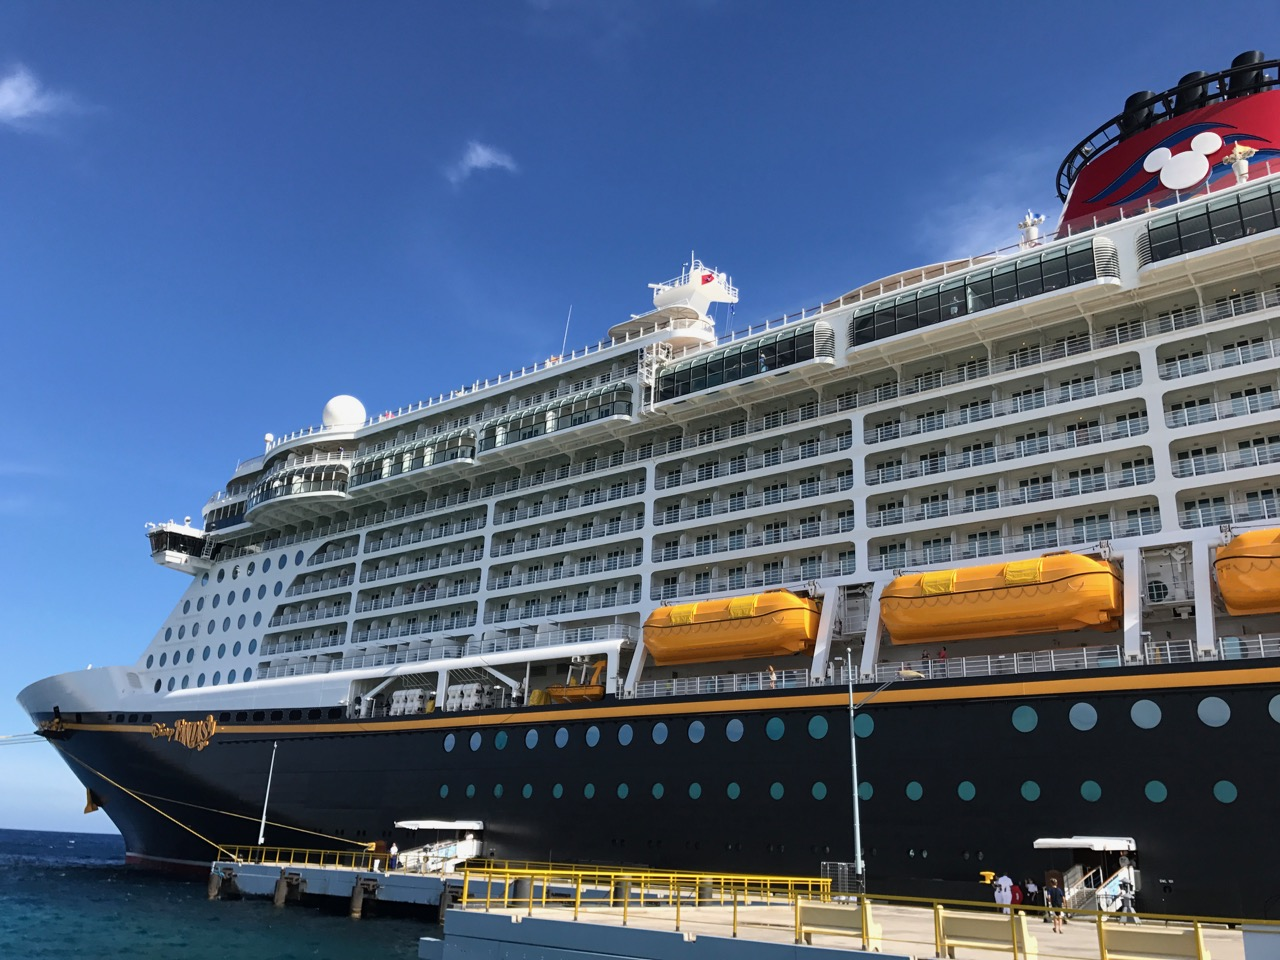 Disney Fantasy Curacao - Ship View From Shore